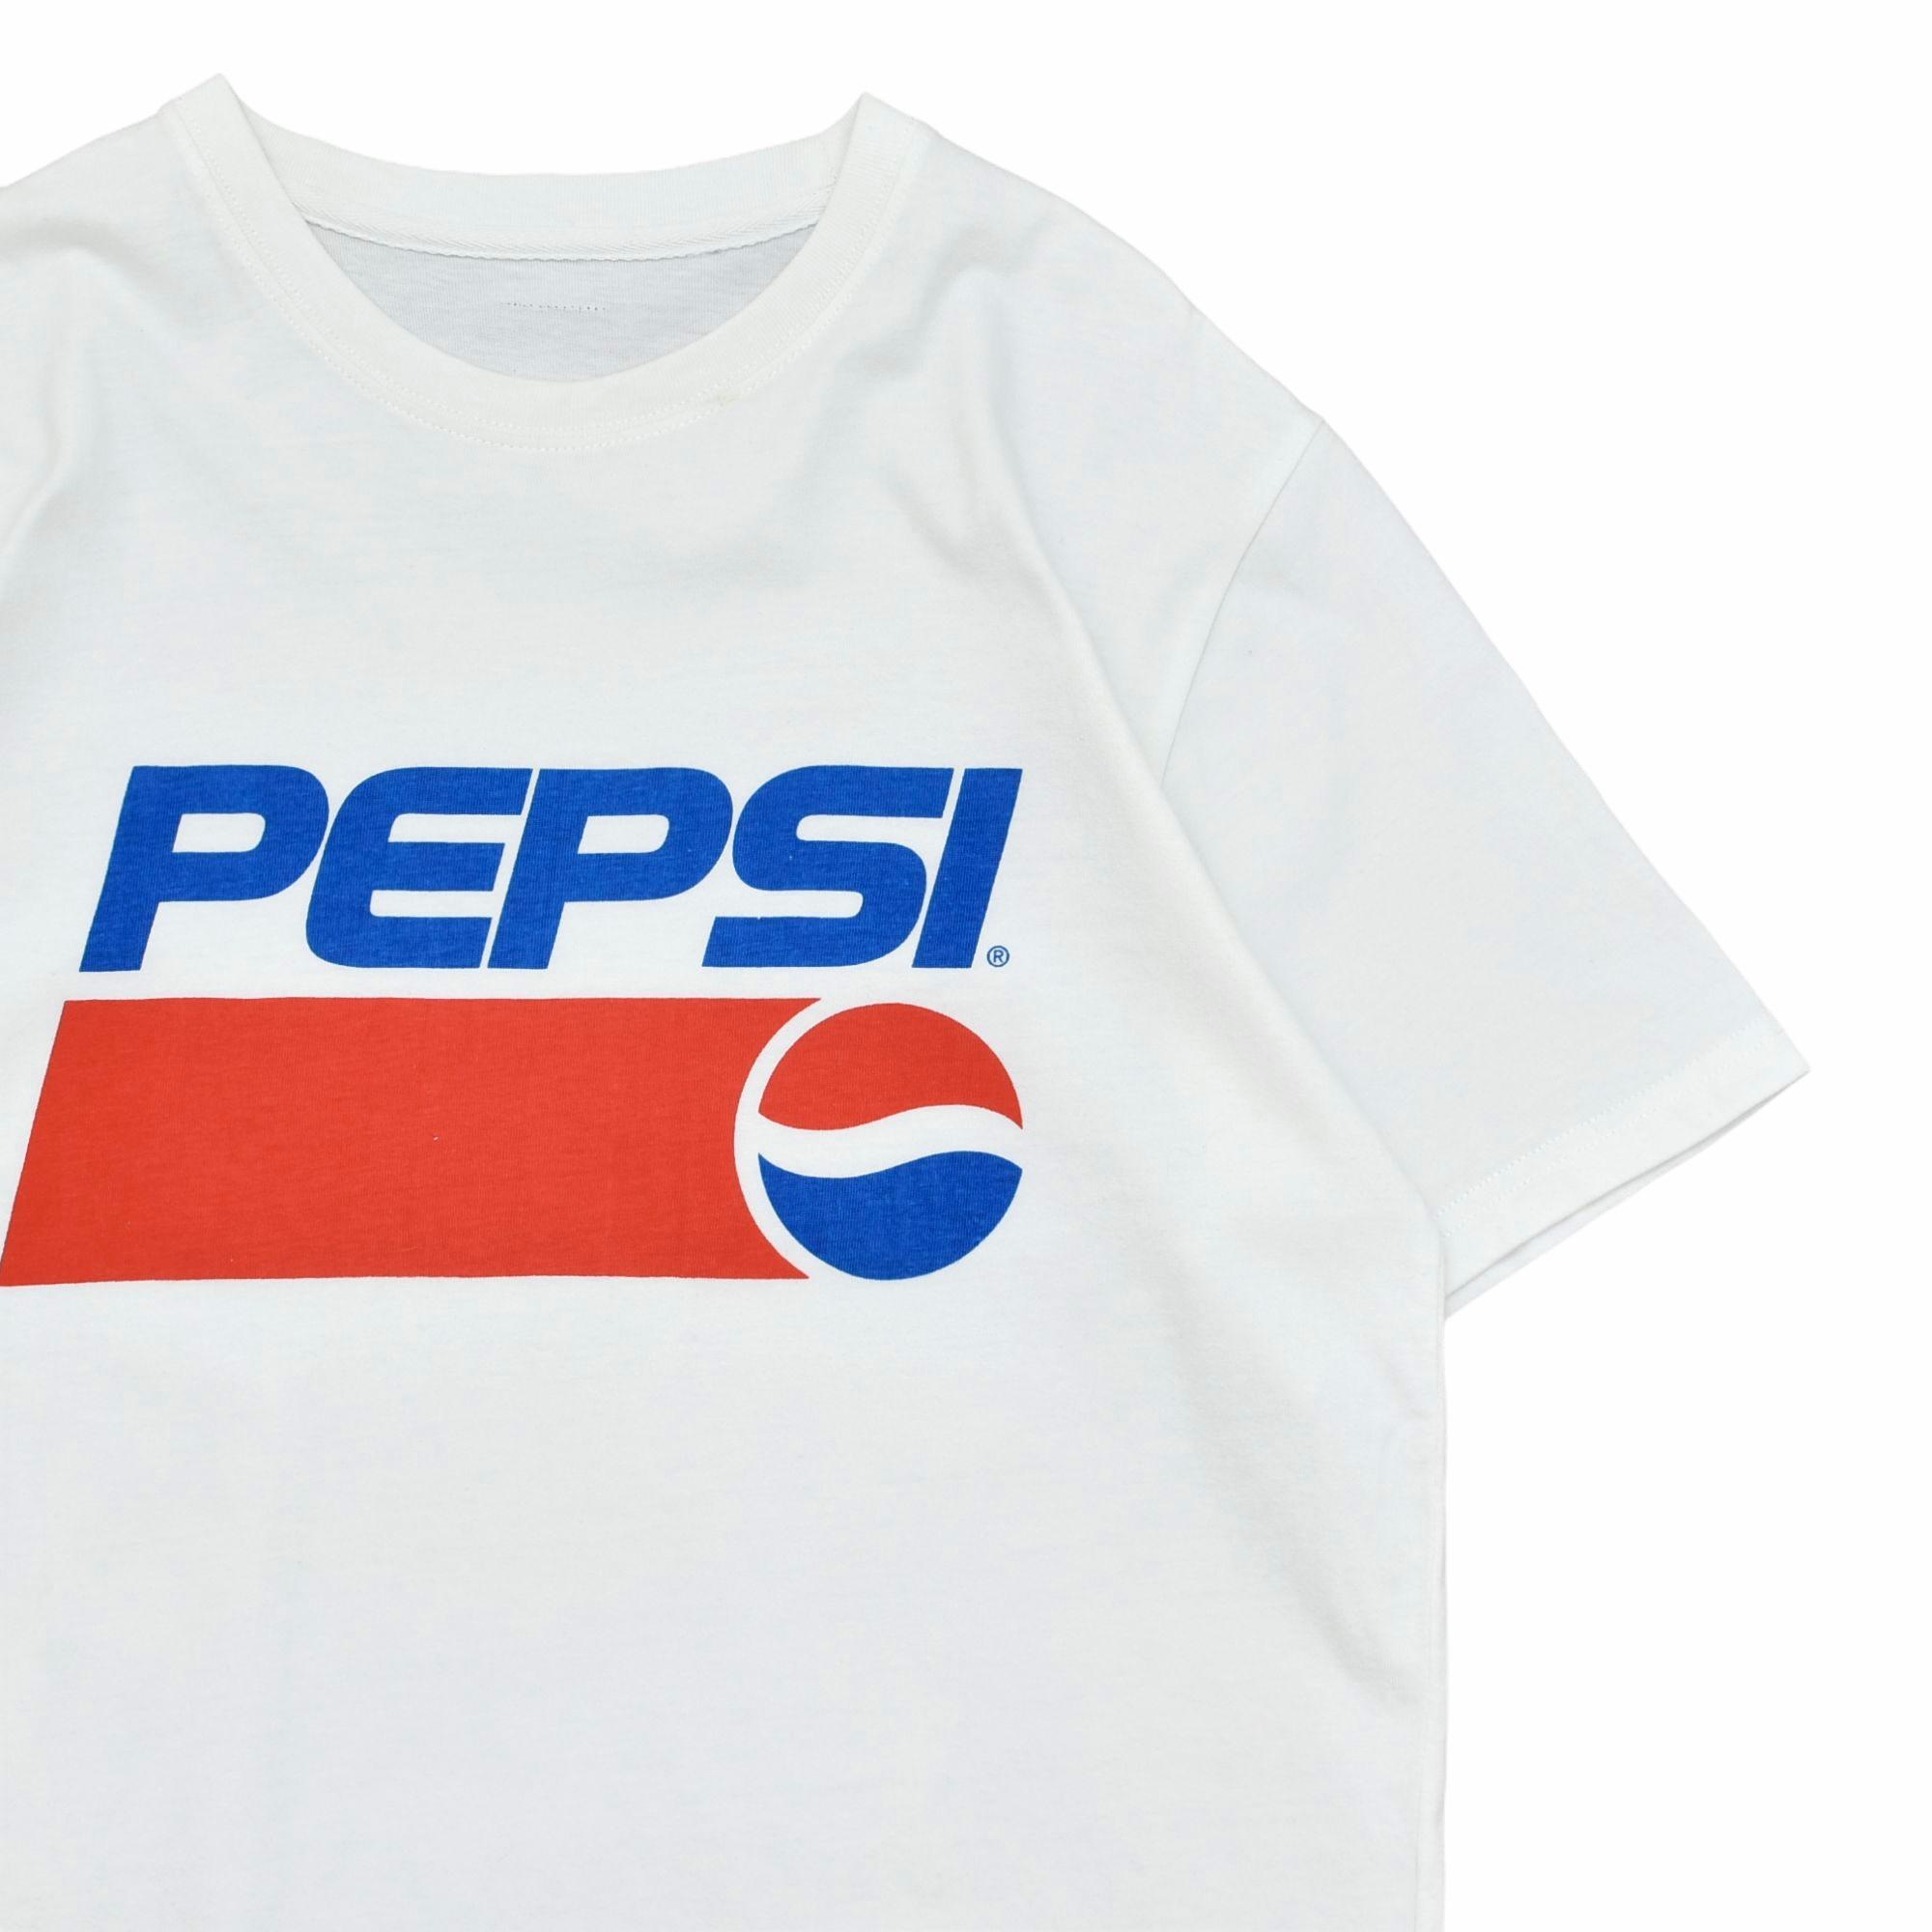 PEPSI COLA logo print T-shirt